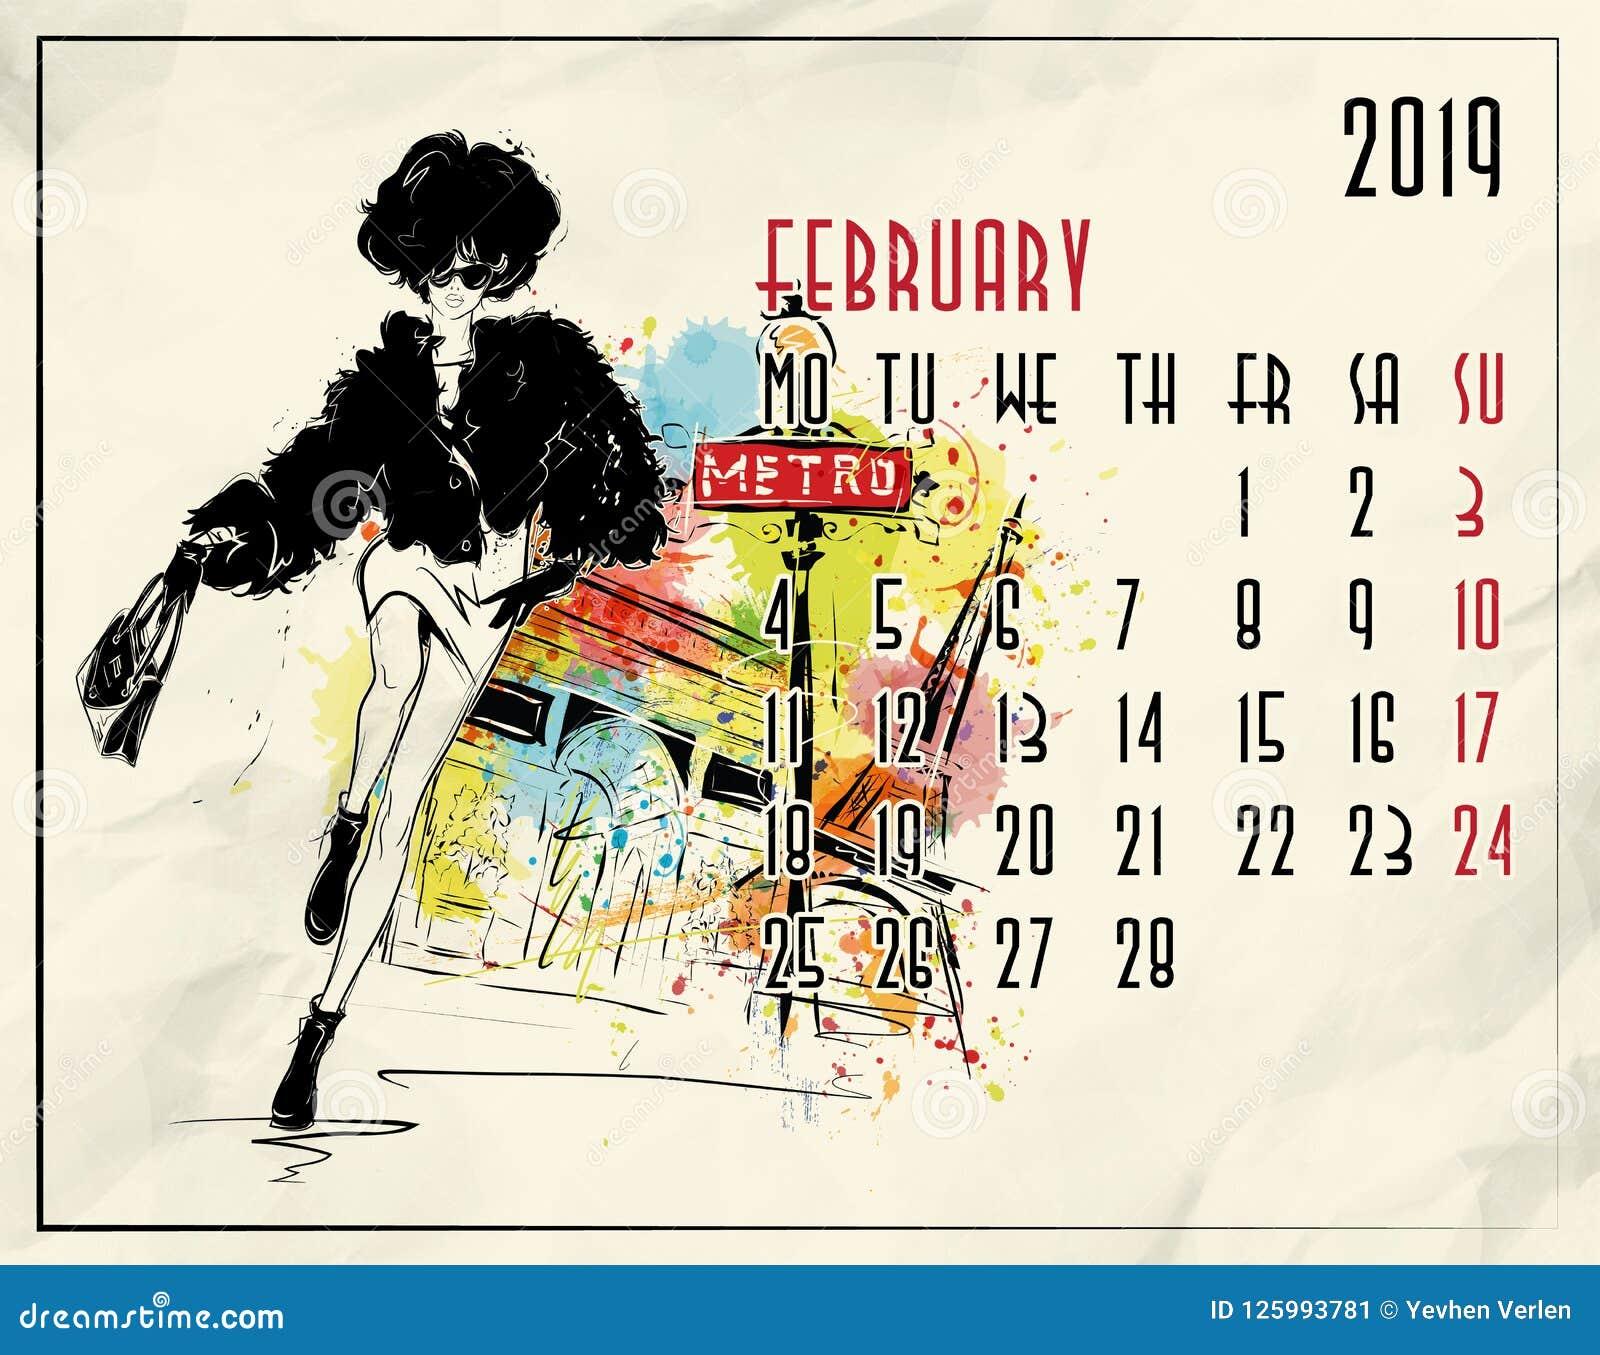 February 2019 Fashion Calendar February. 2019 European Calendar With Fashion Girl Stock